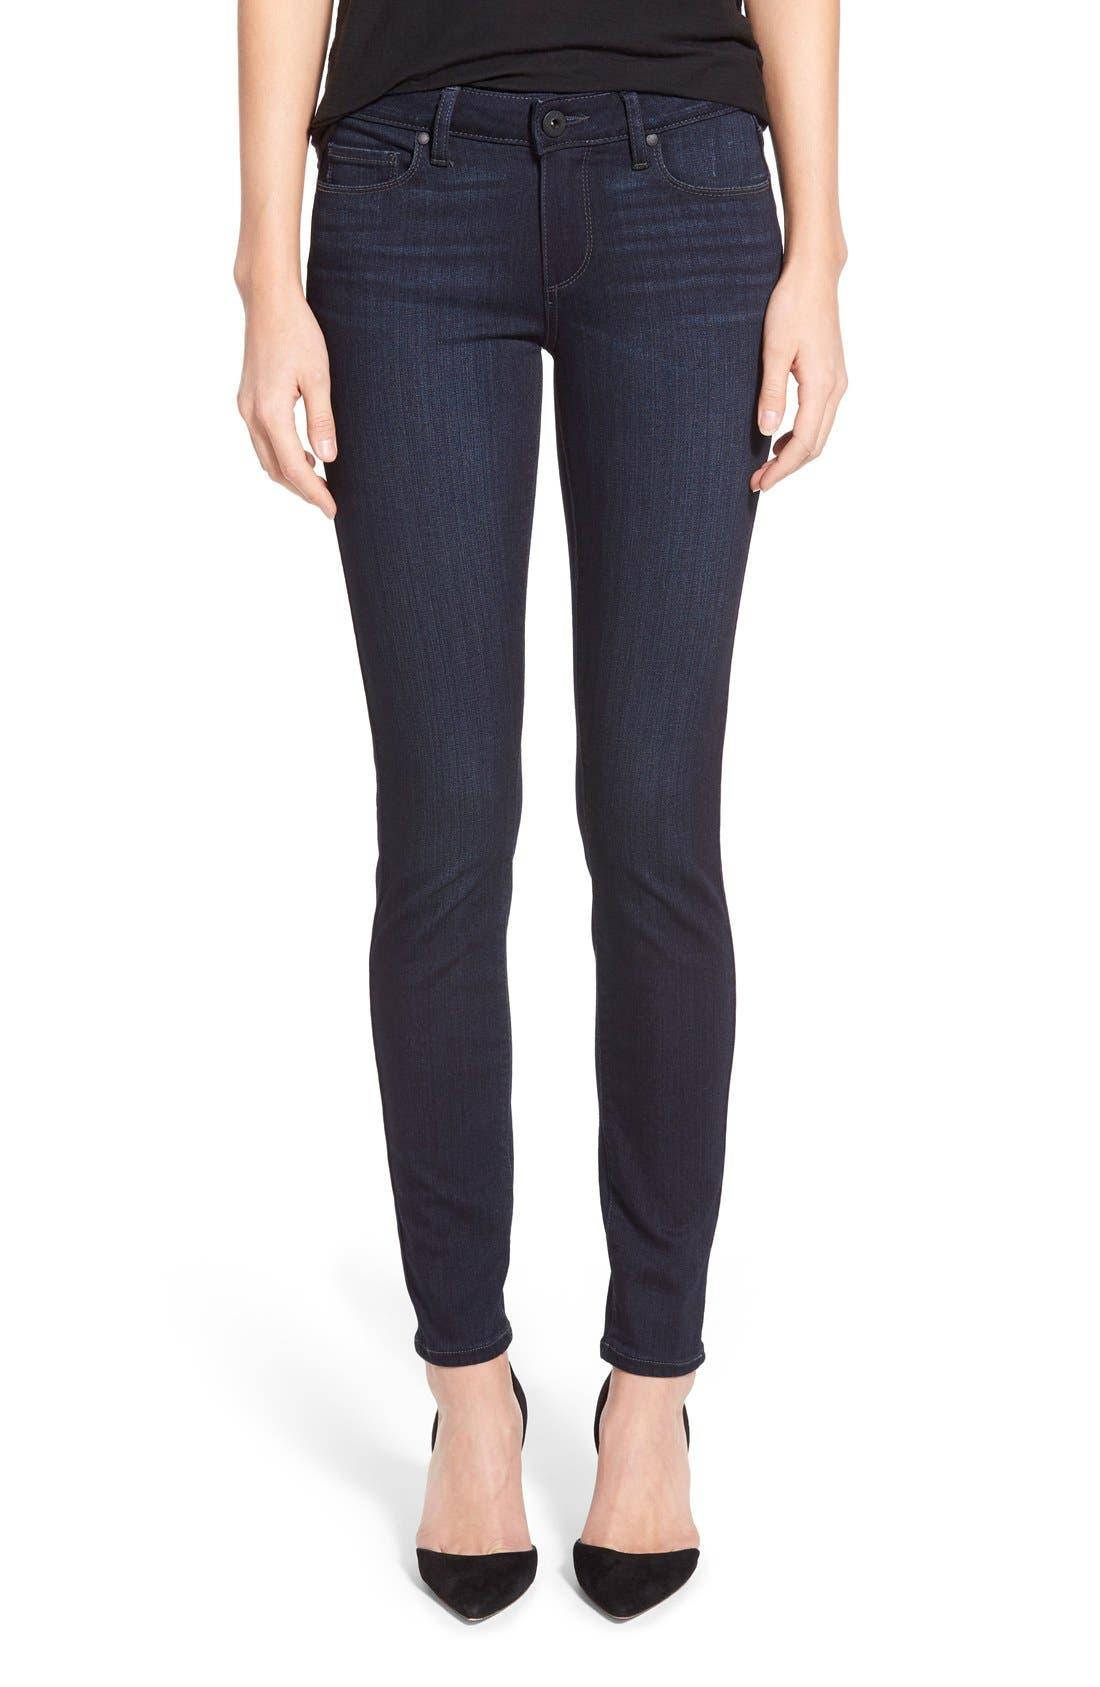 Transcend - Verdugo Ultra Skinny Jeans,                             Main thumbnail 2, color,